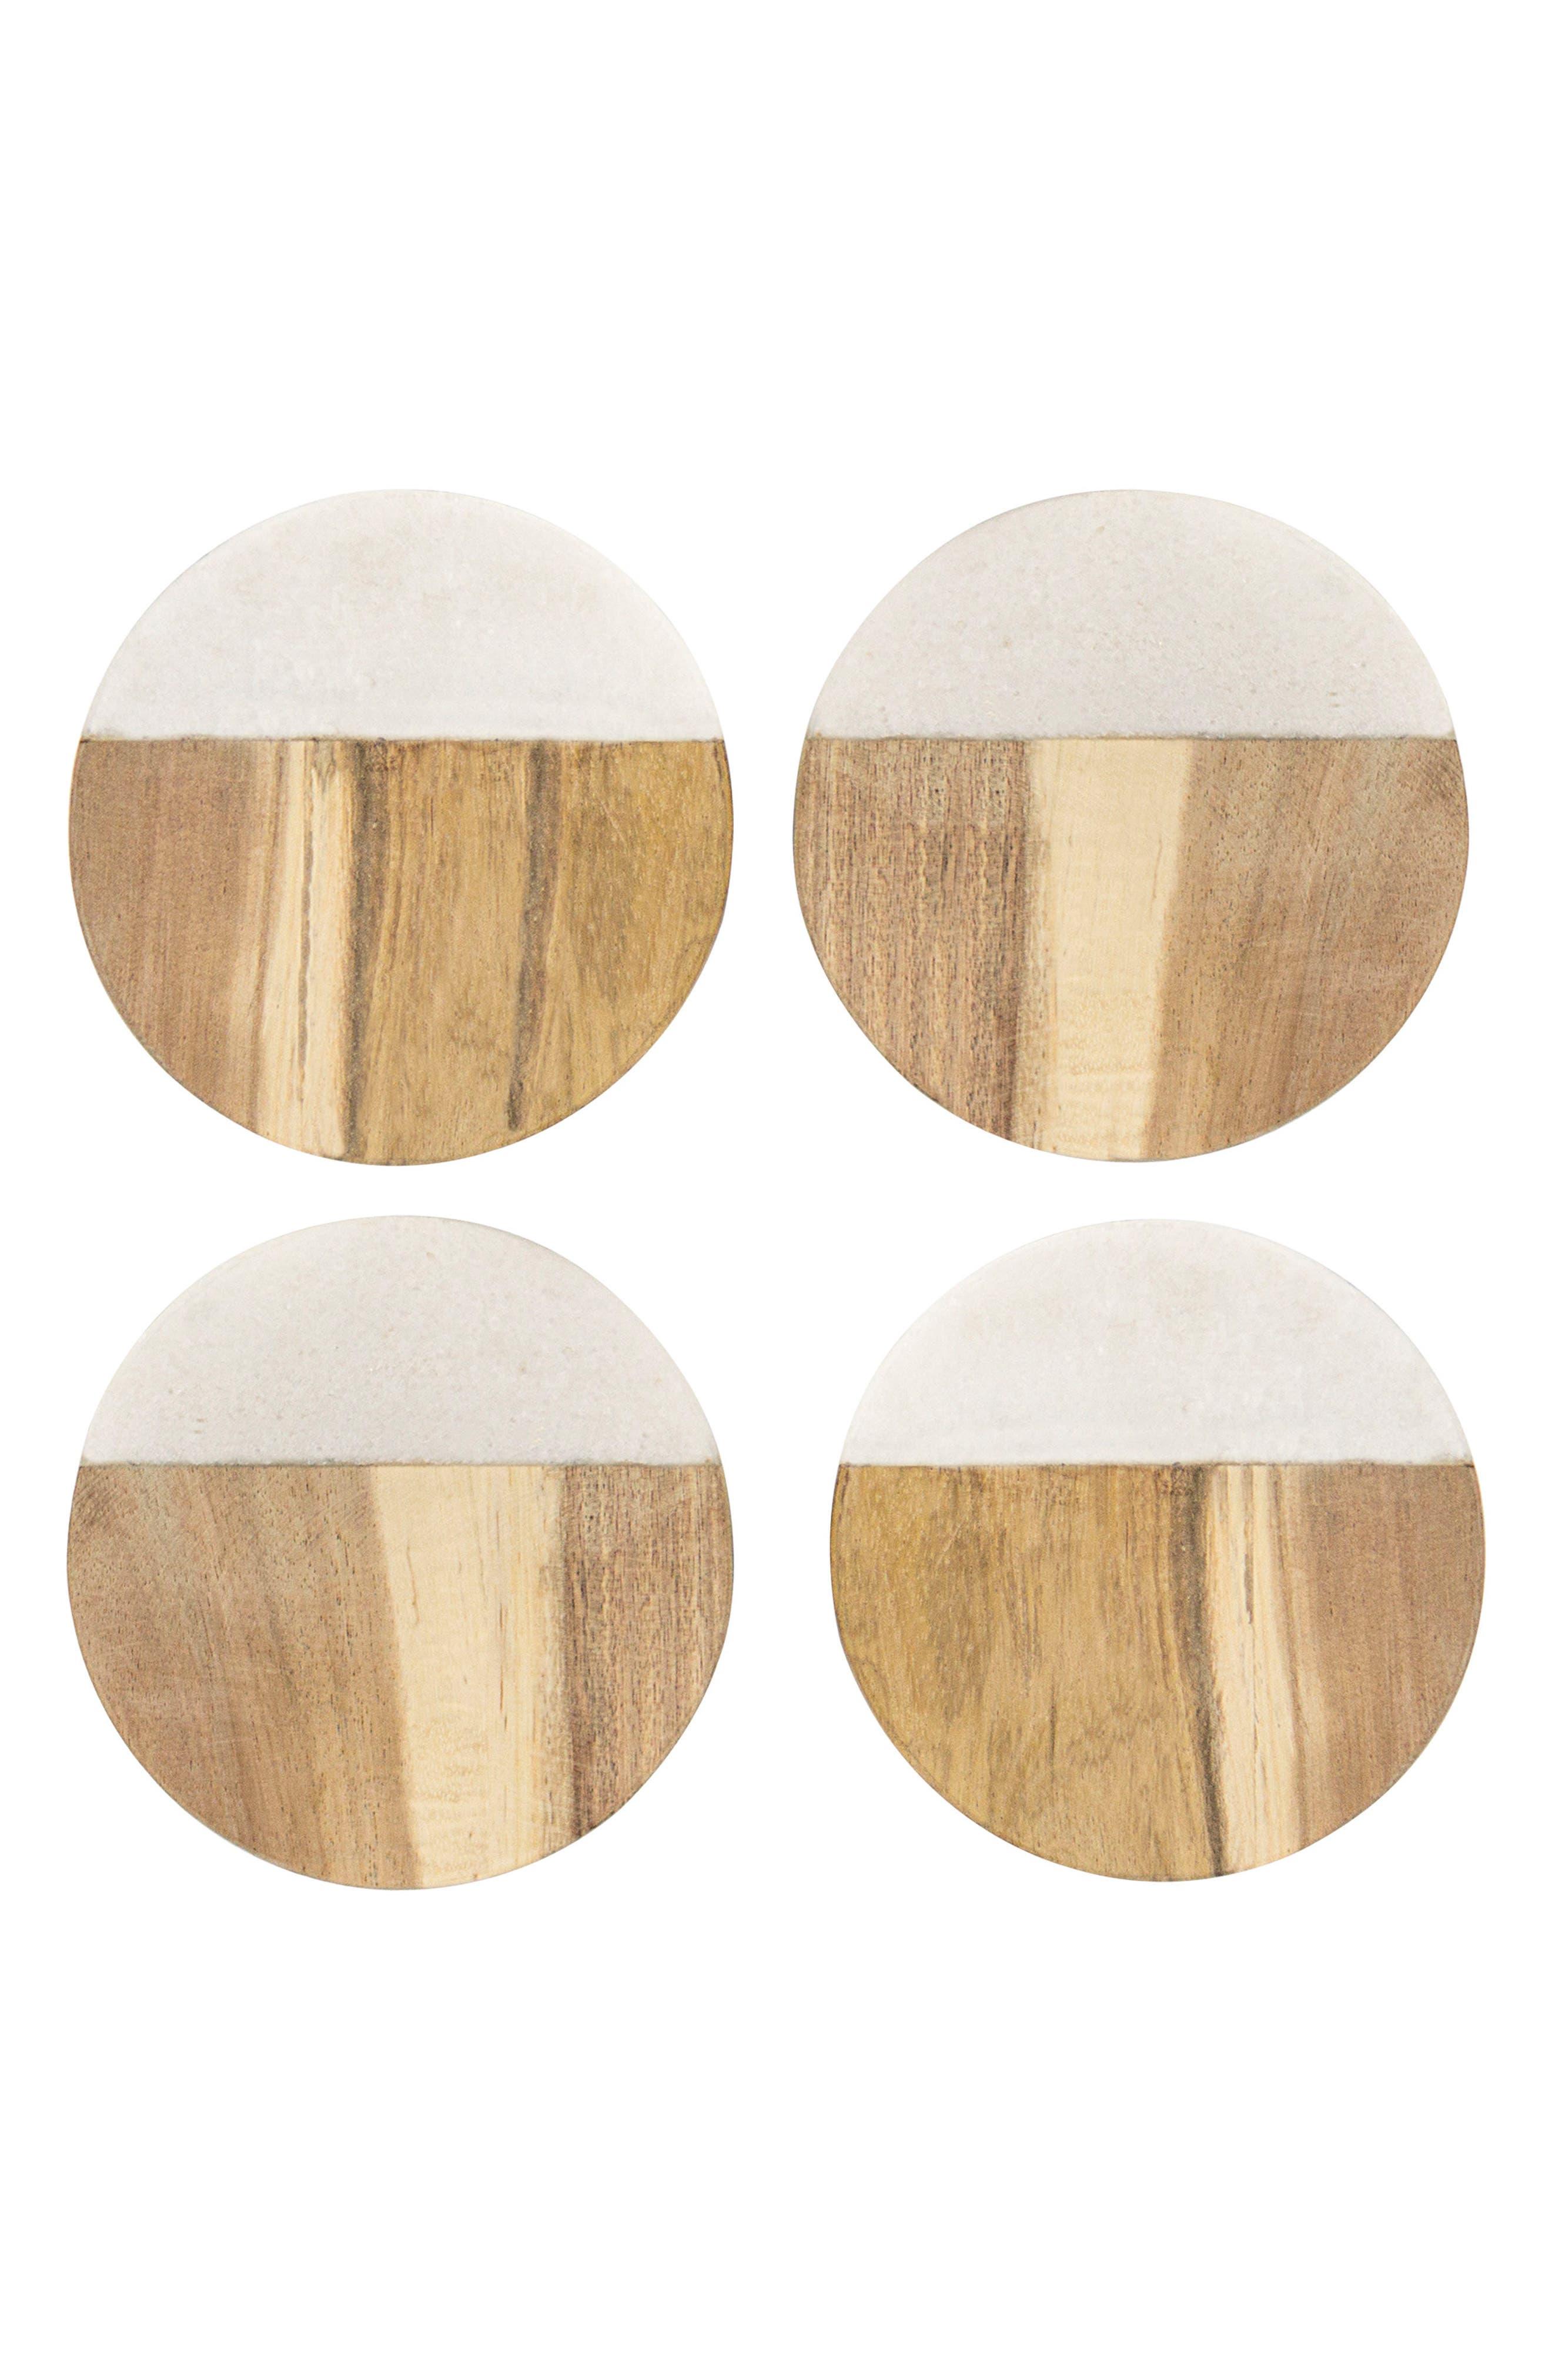 Cathy's Concepts Monogram Set of 4 Marble & Acacia Wood Coasters